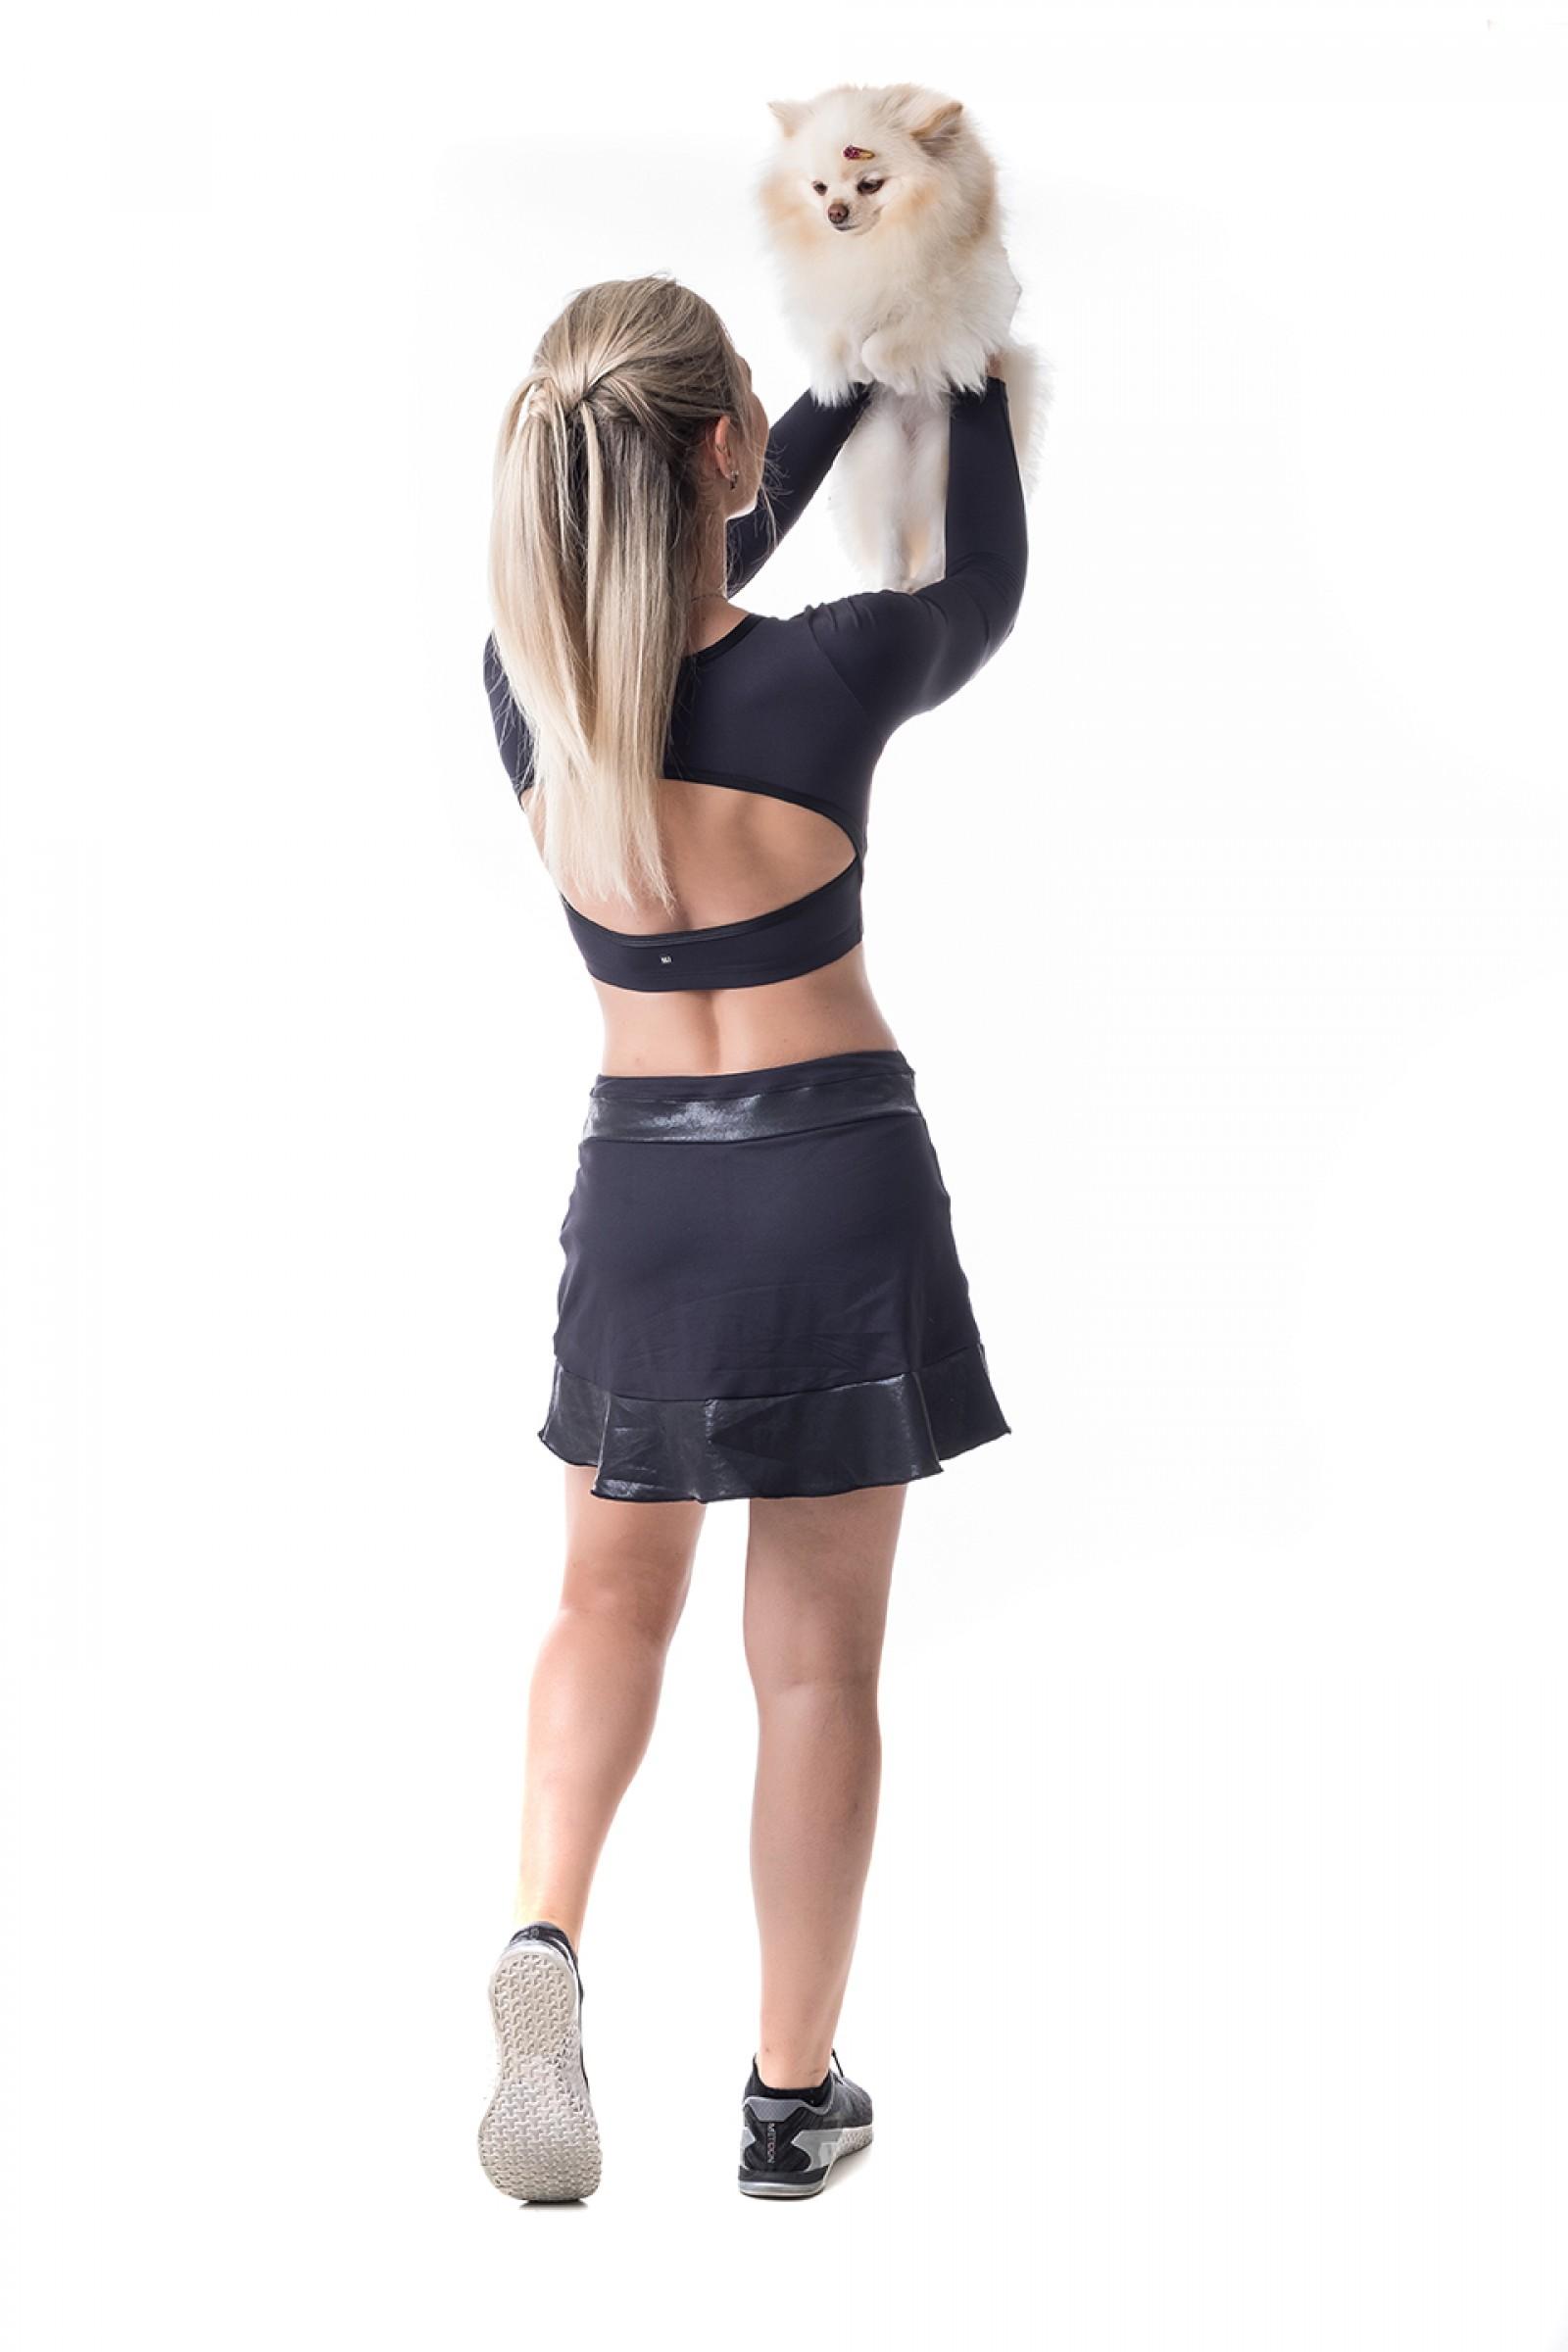 Saia Shorts Surpass Preto Crak, Coleção Challenge - NKT Fitwear Moda Fitness